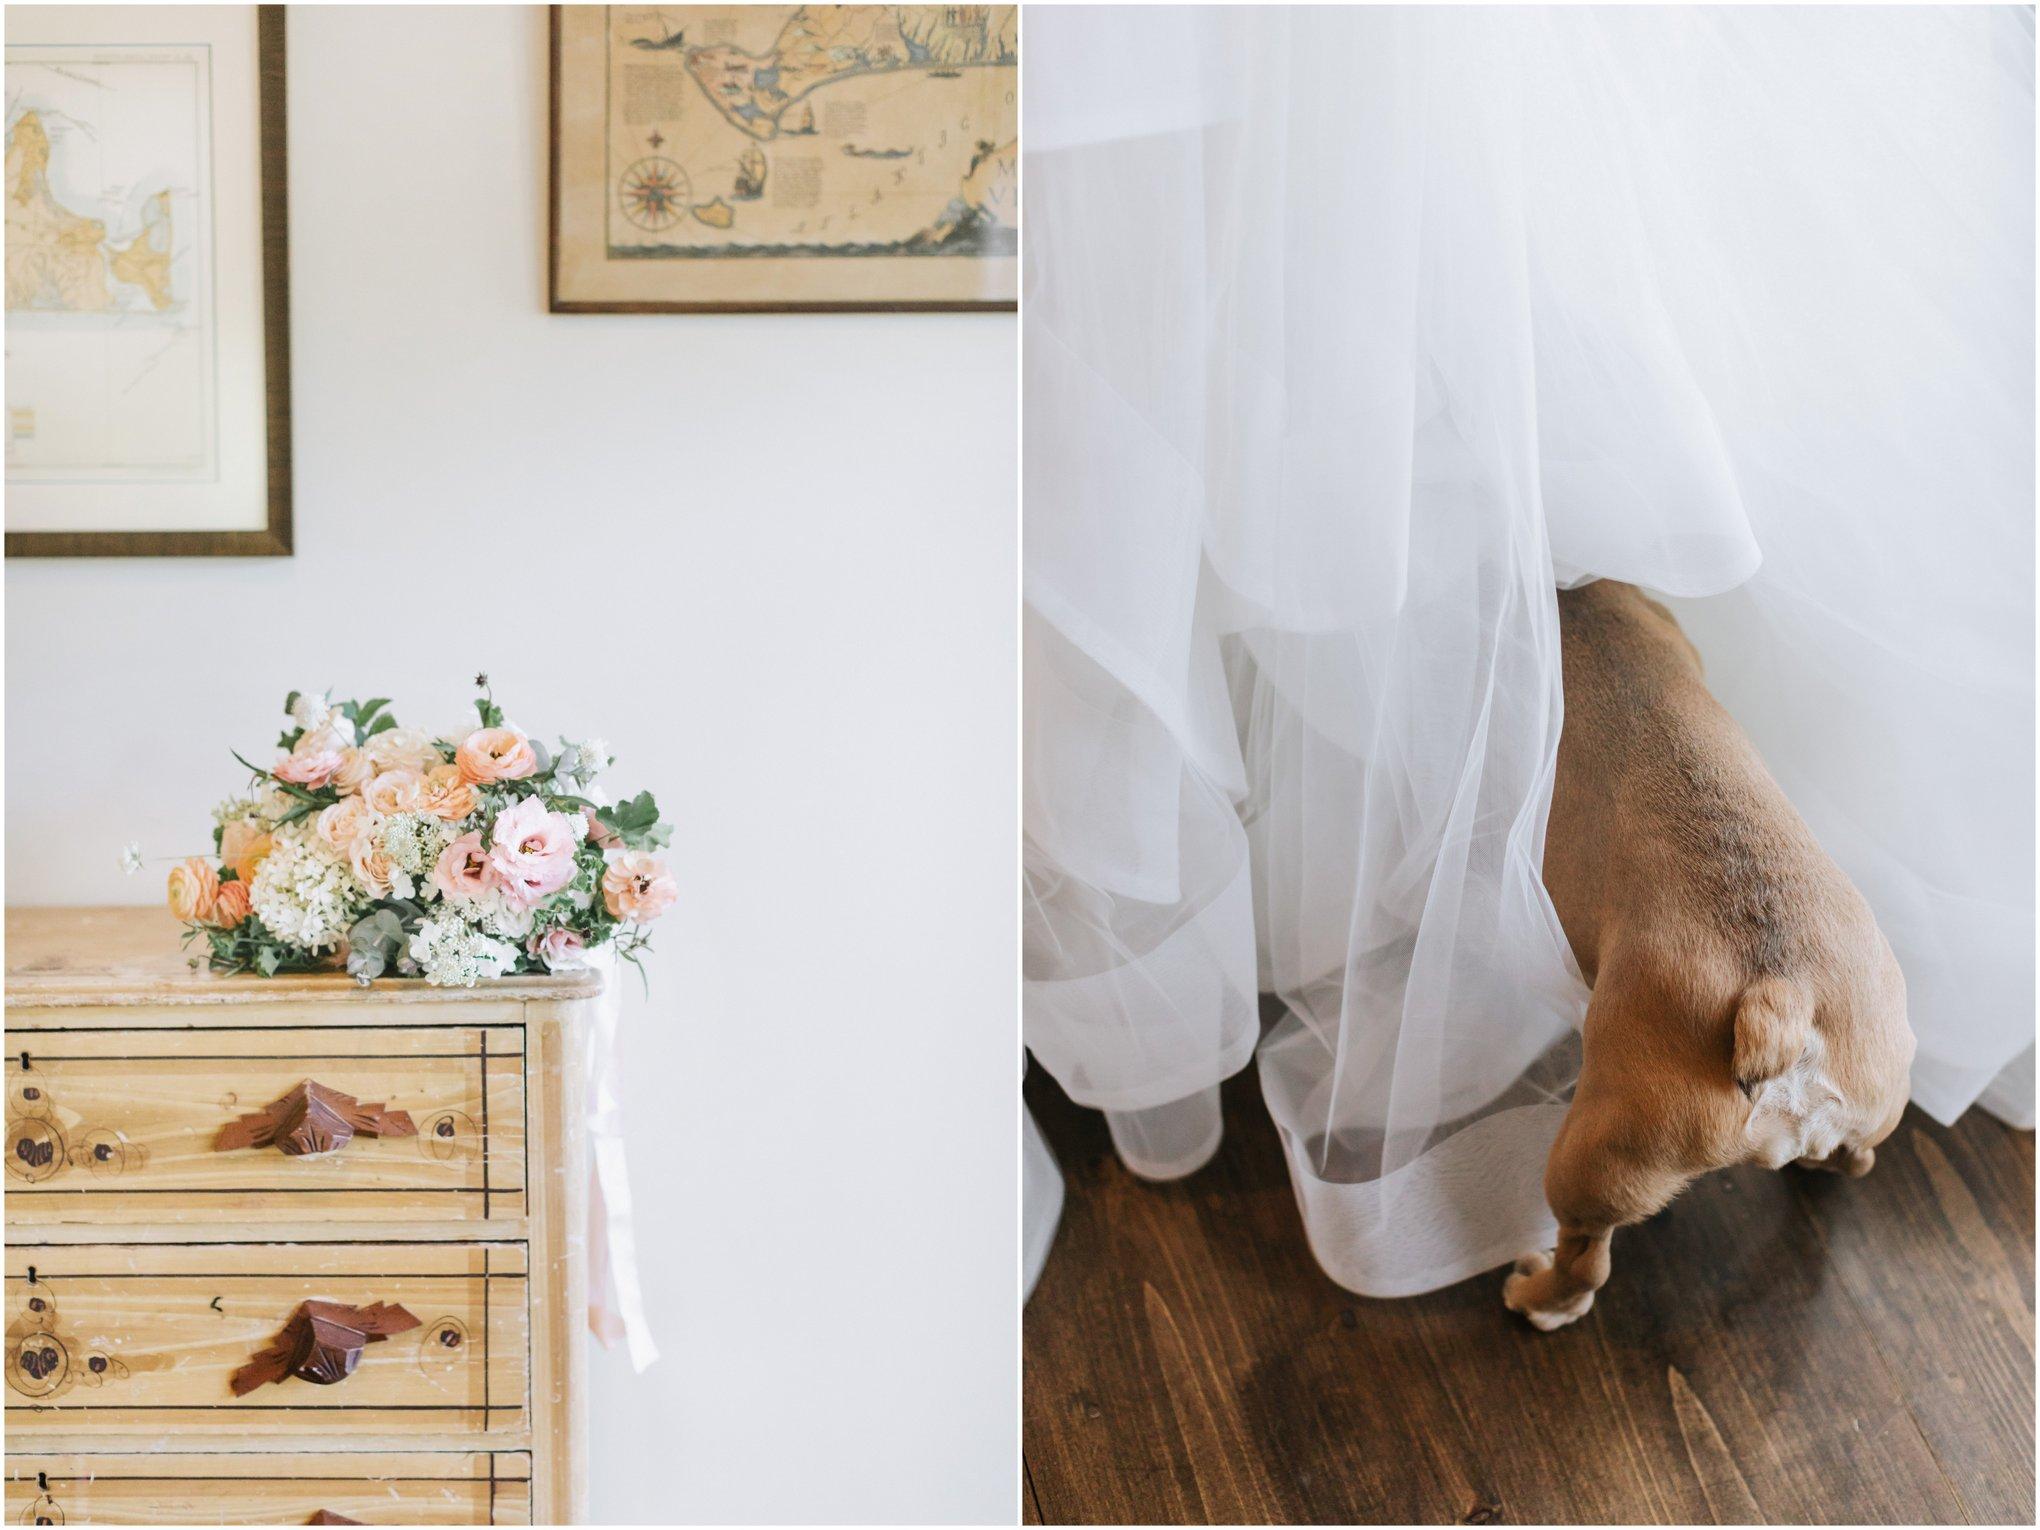 Marthas-Vineyard-Wedding-Photographer-Beach-Plum-Inn-5.jpg